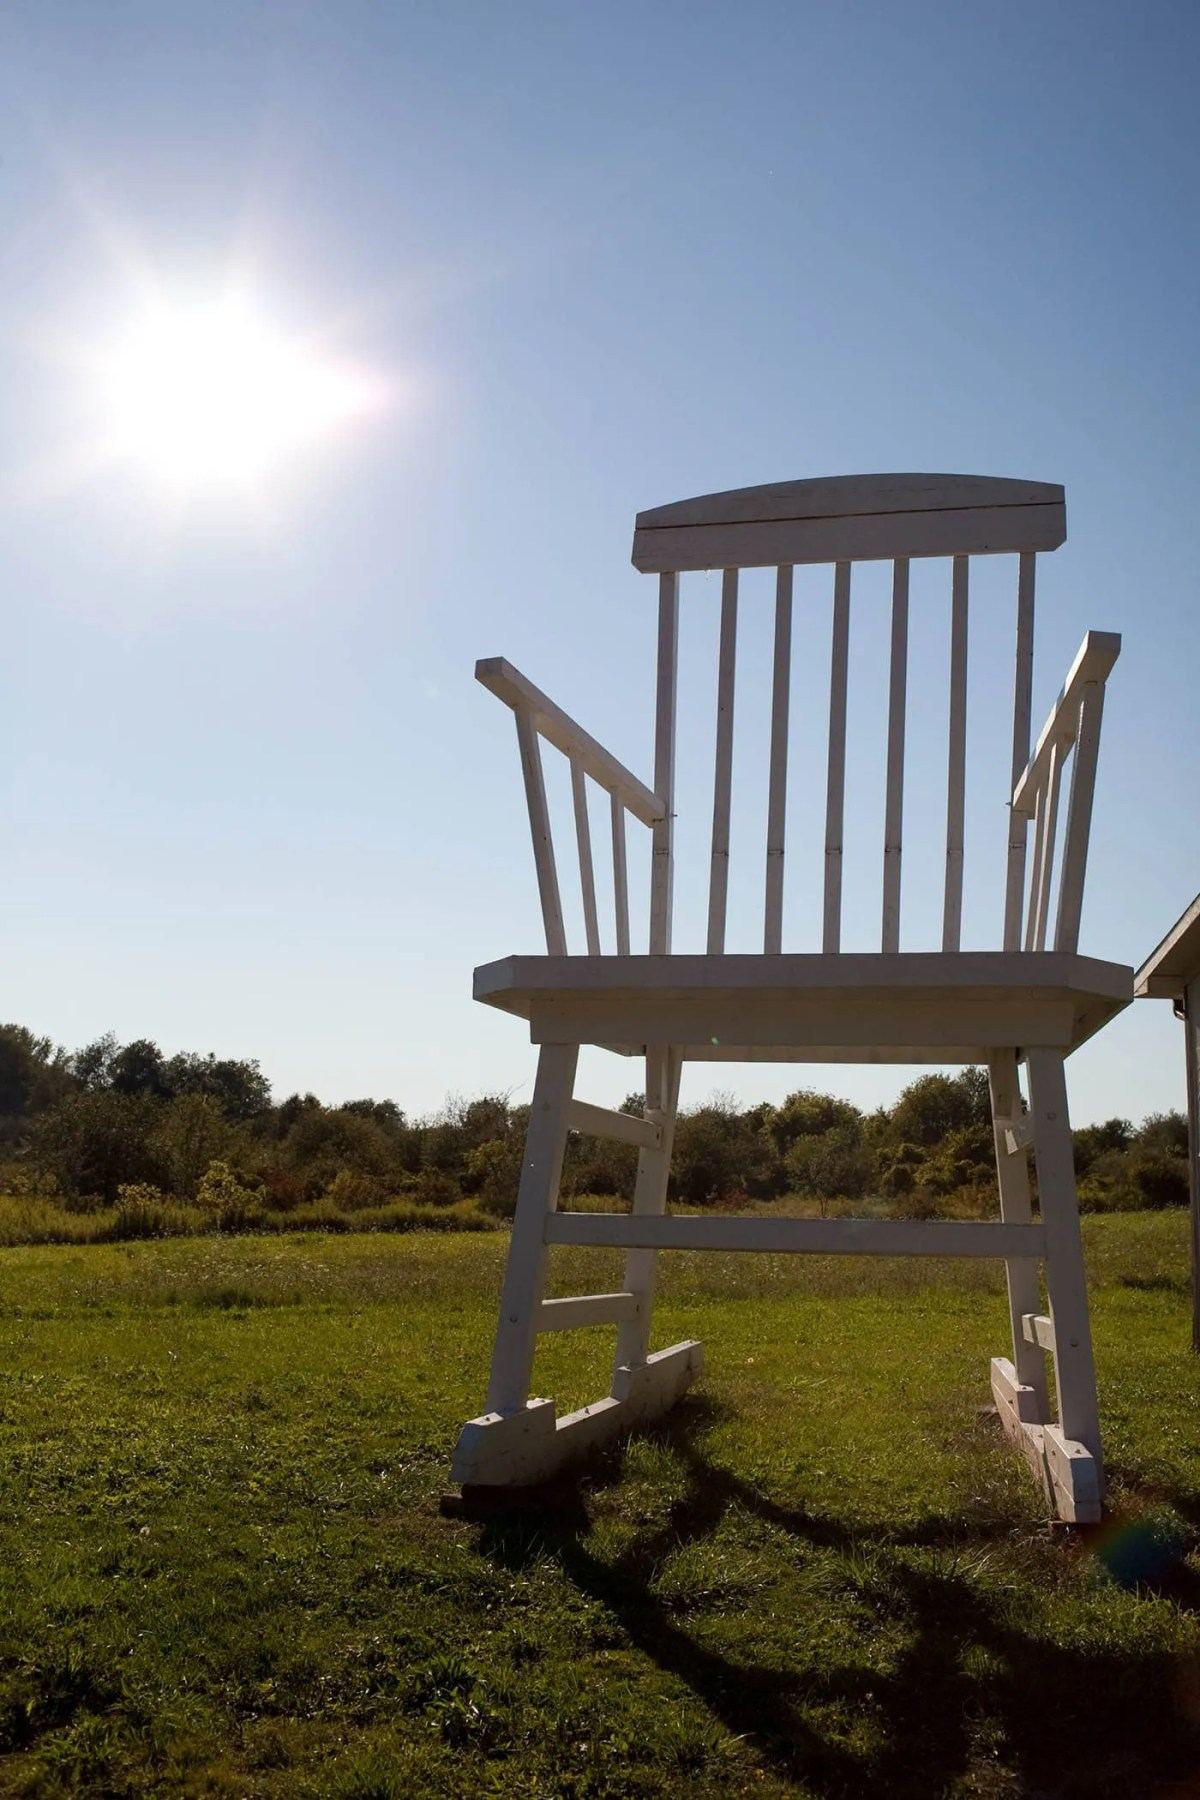 Giant Rocking Chair in Austinburg, Ohio.